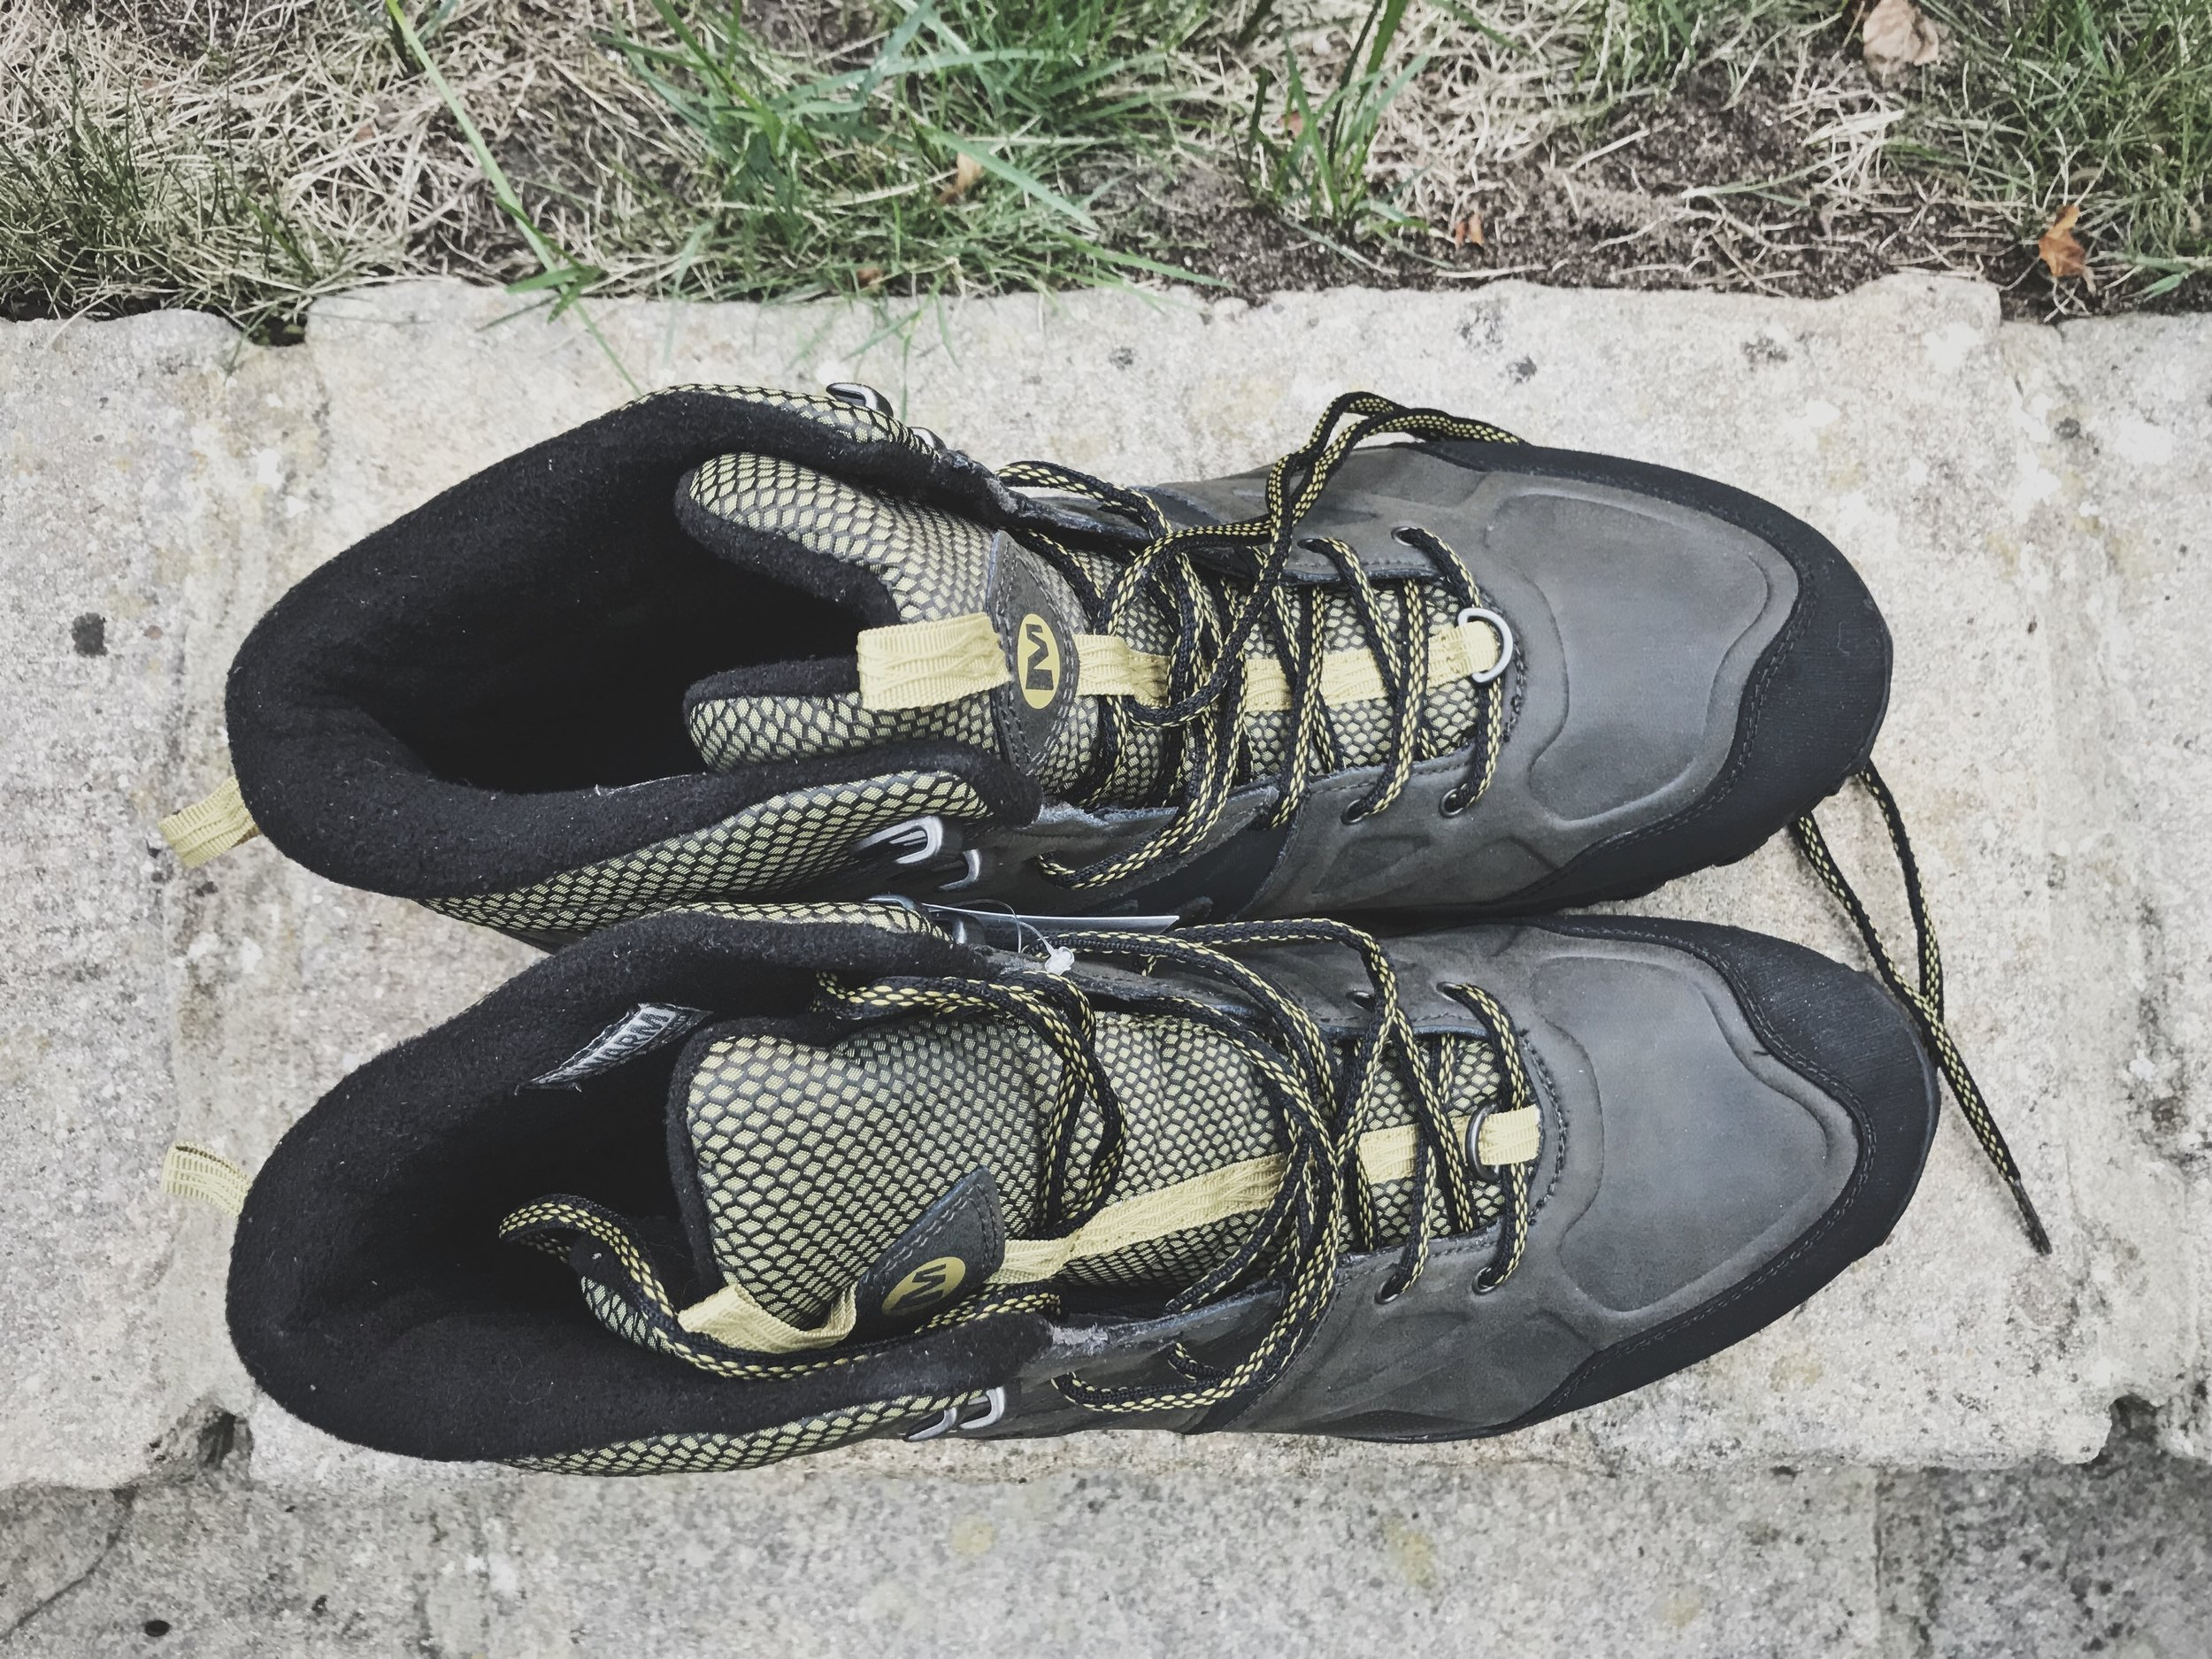 hiking boots2.JPG